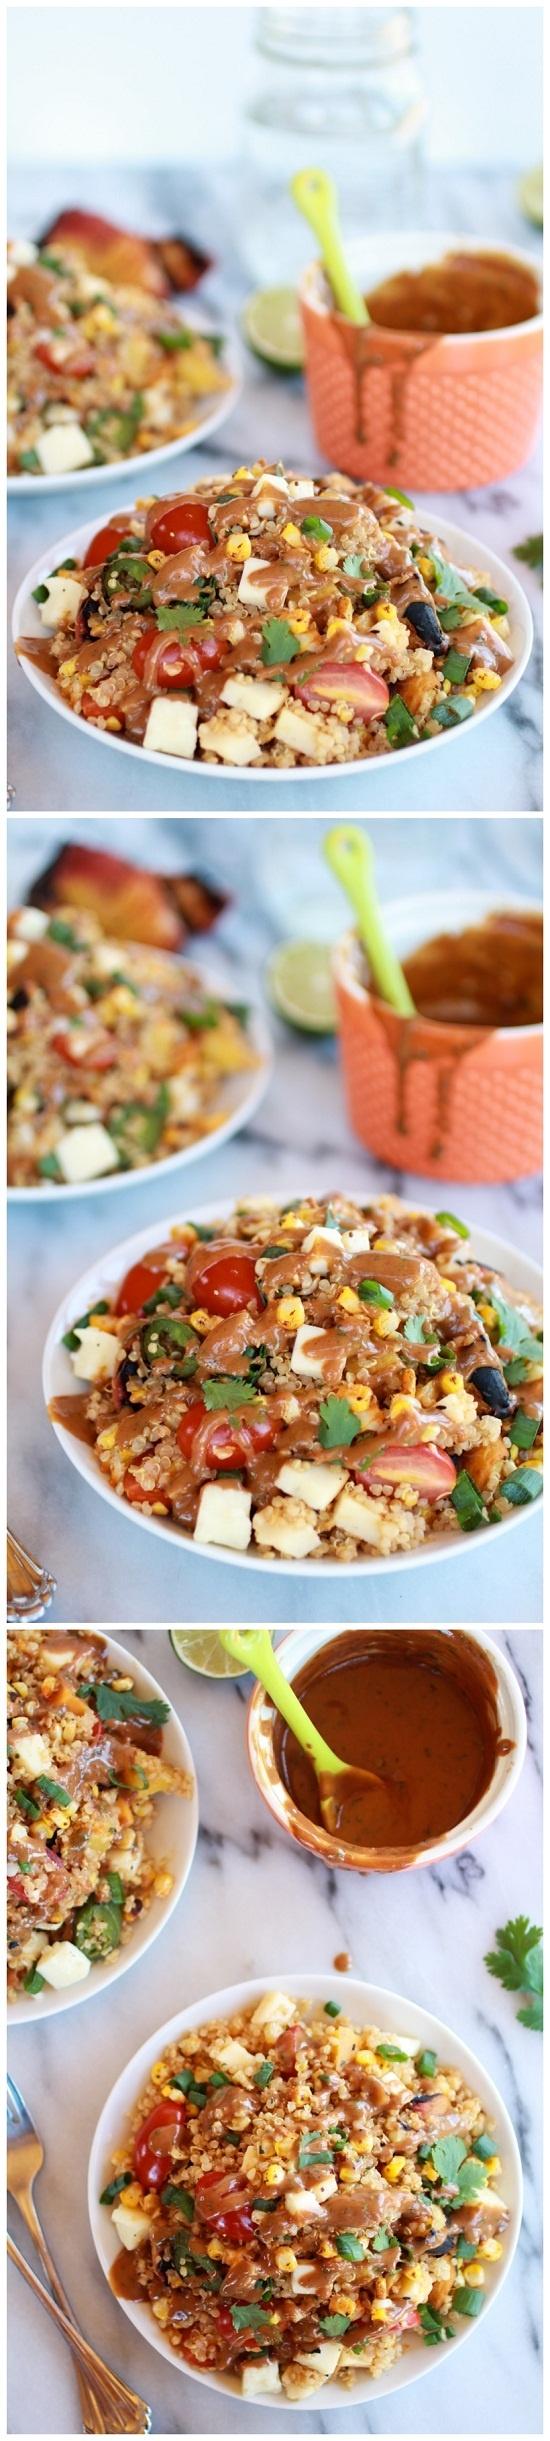 BBQ Grilled Corn, Jalapeño and Peach Quinoa Salad